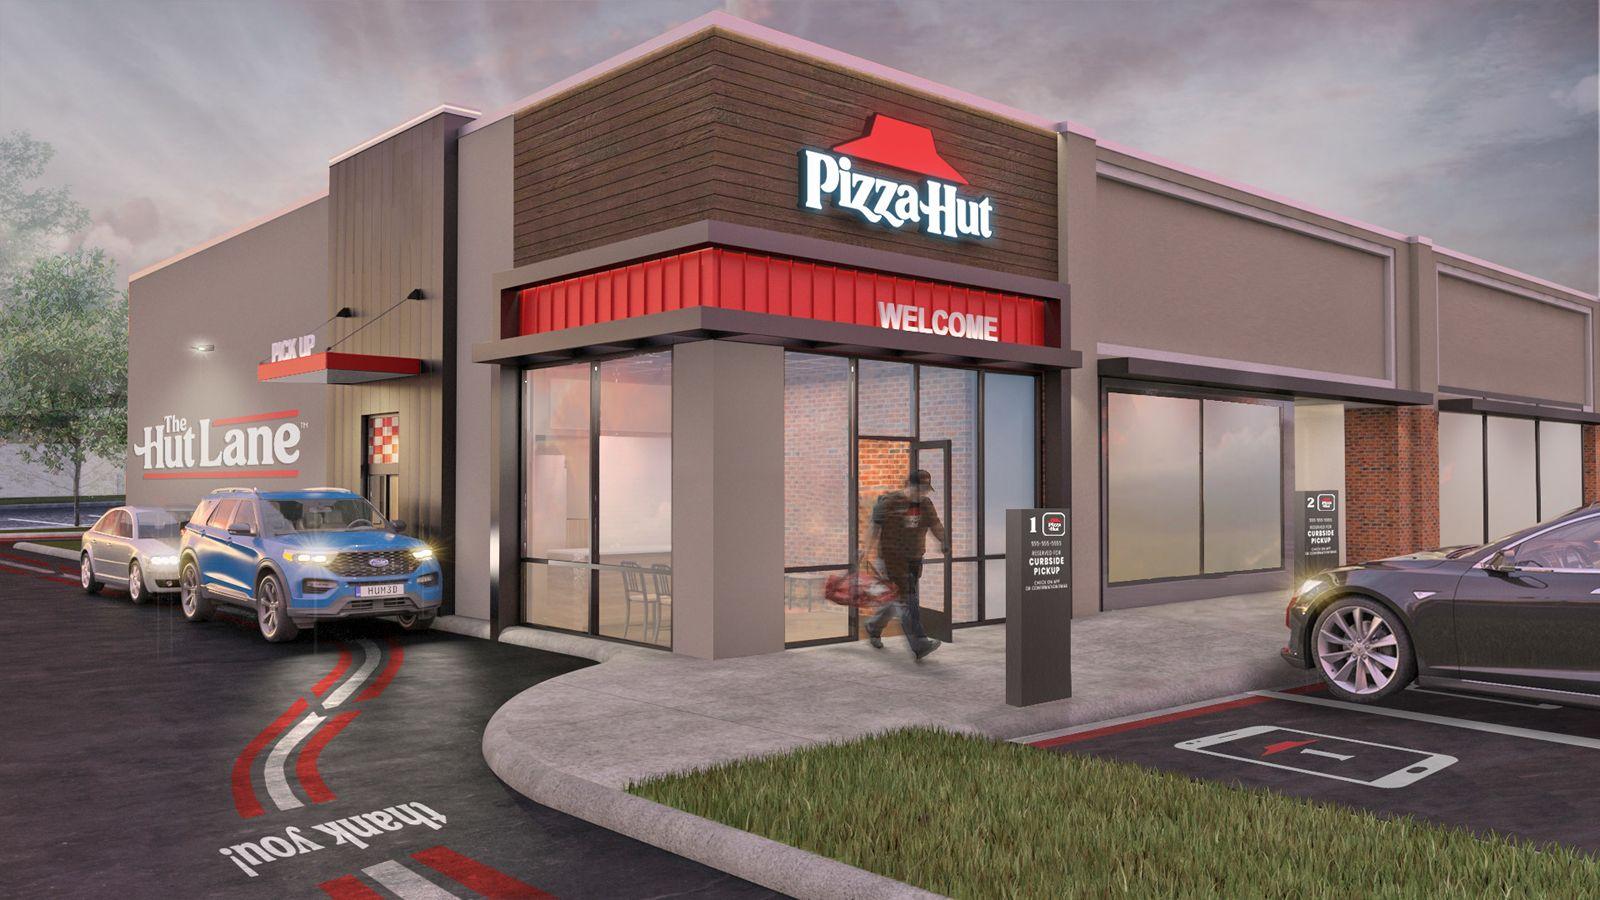 Pizza Hut Launches The Hut Lane — A Digital-First Carryout Option | RestaurantNewsRelease.com